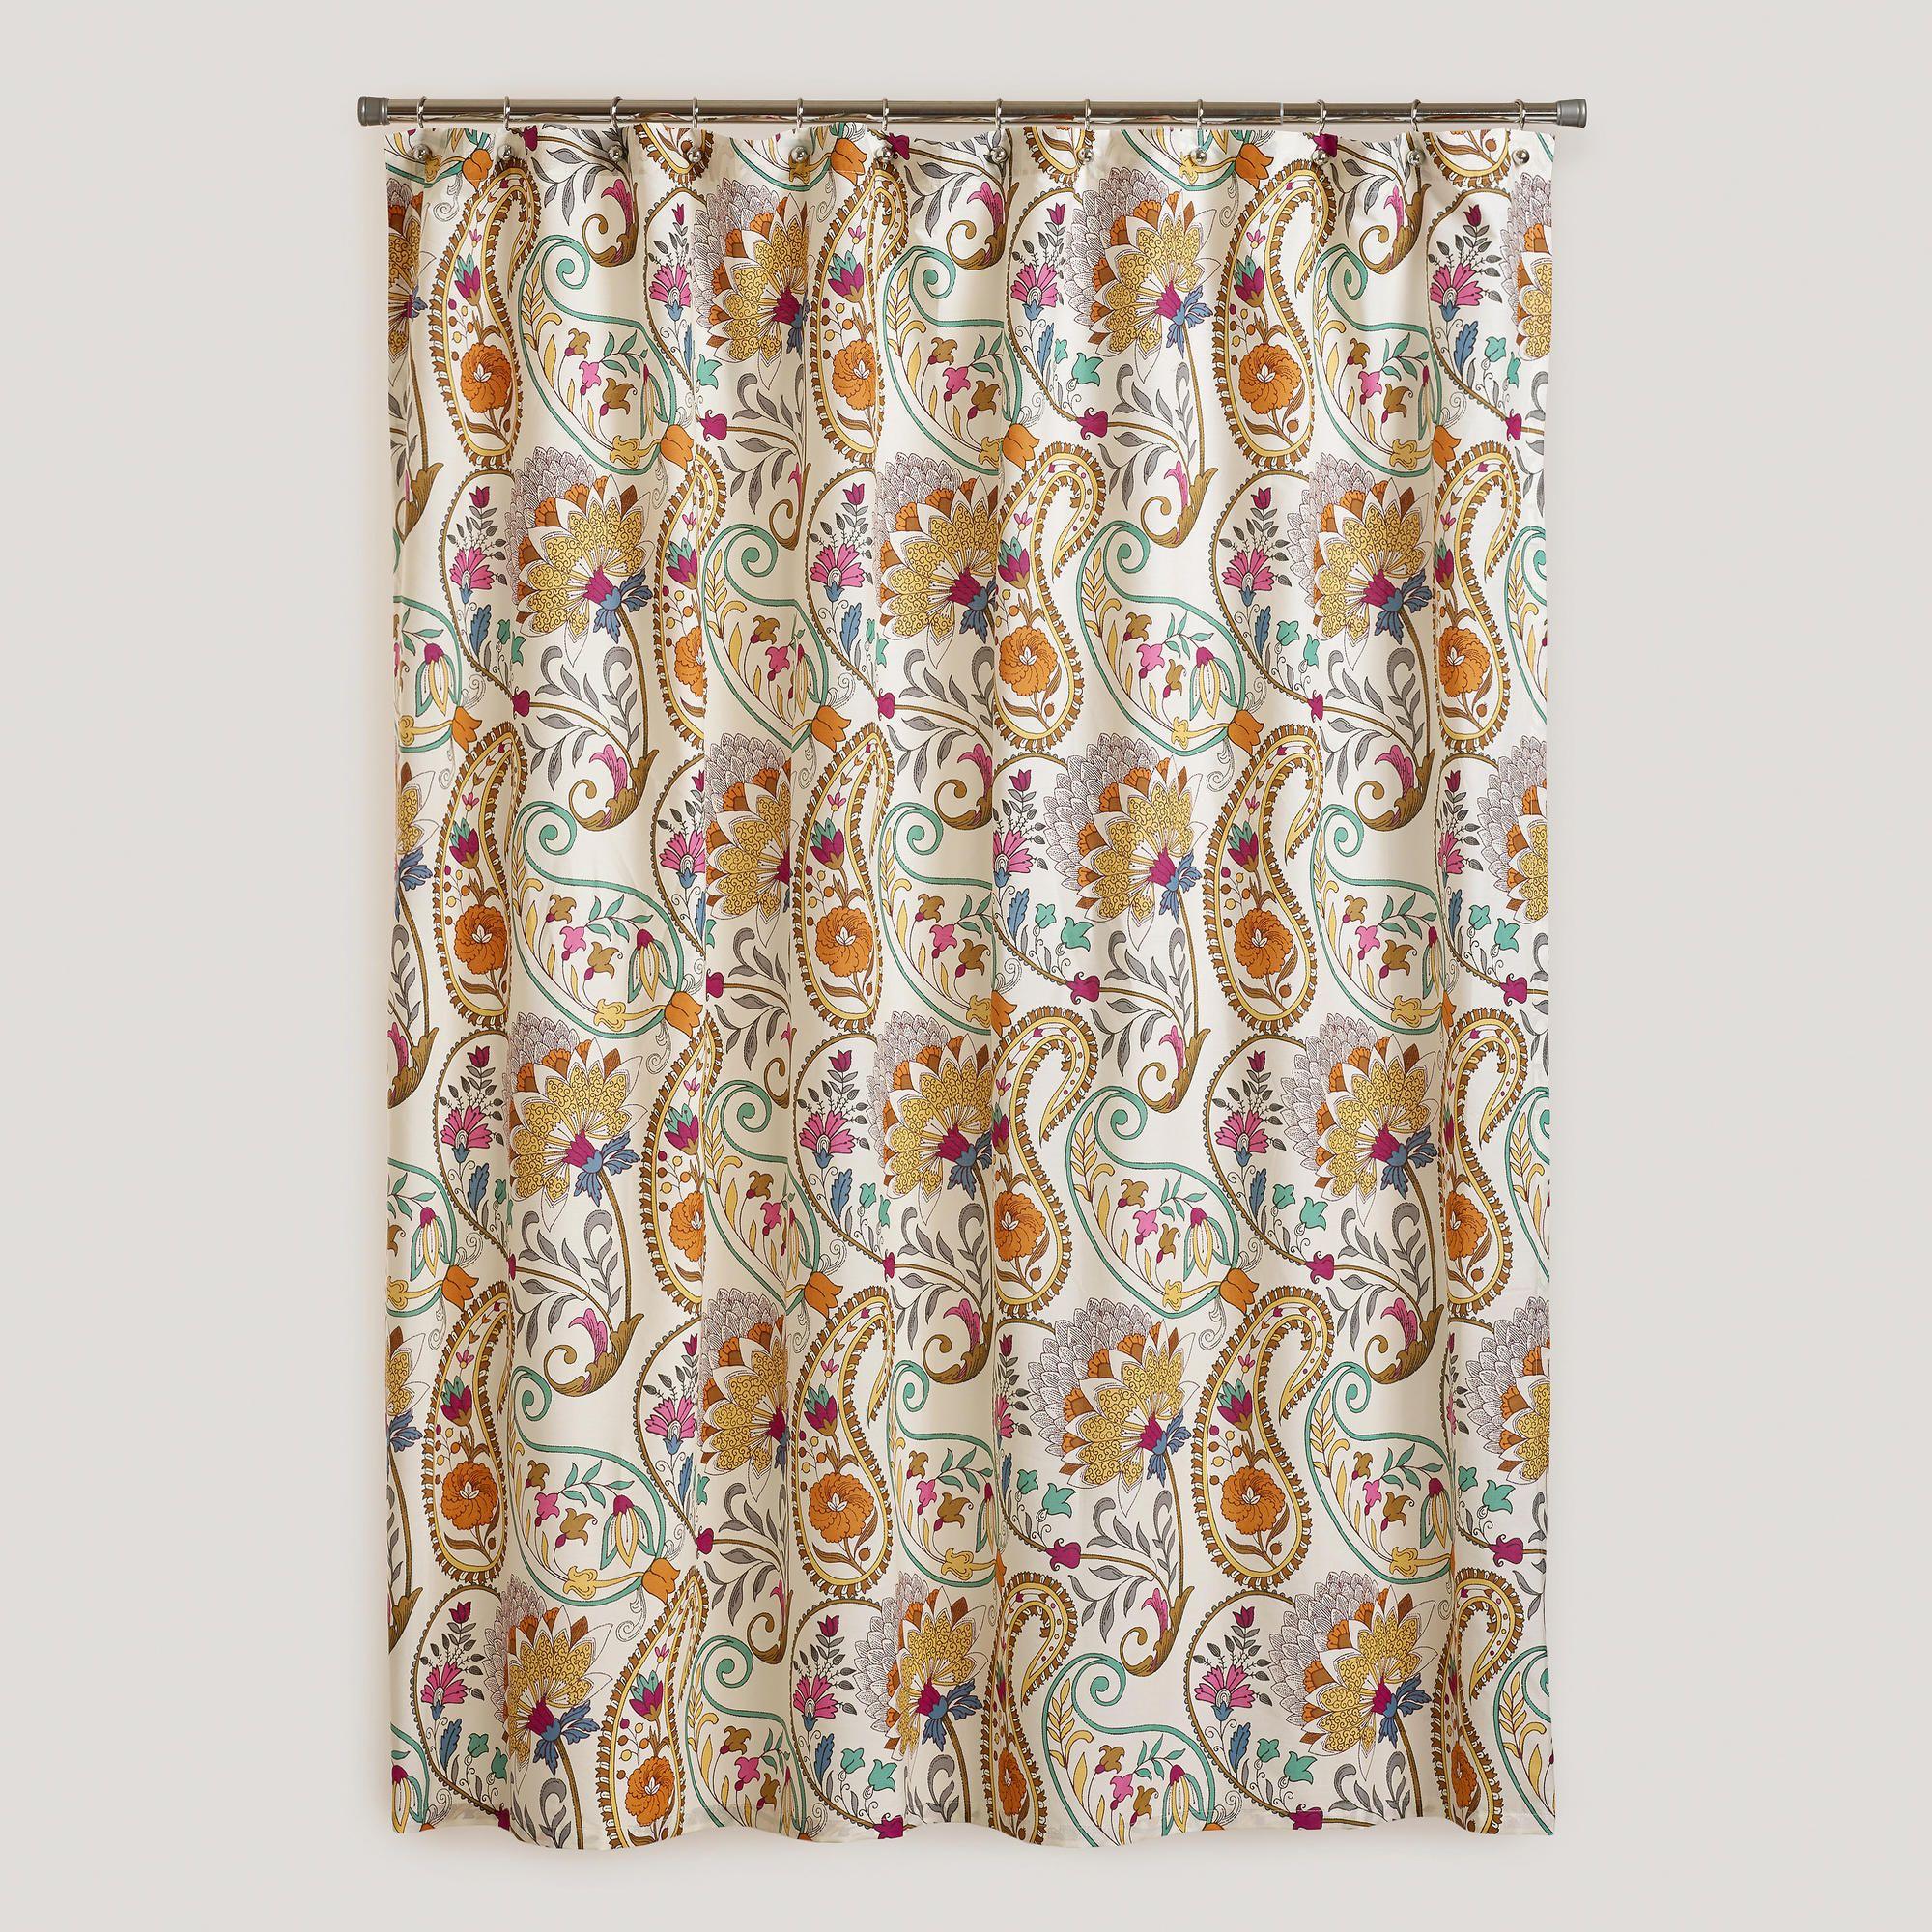 Paisley Floral Shower Curtain World Market Floral Shower